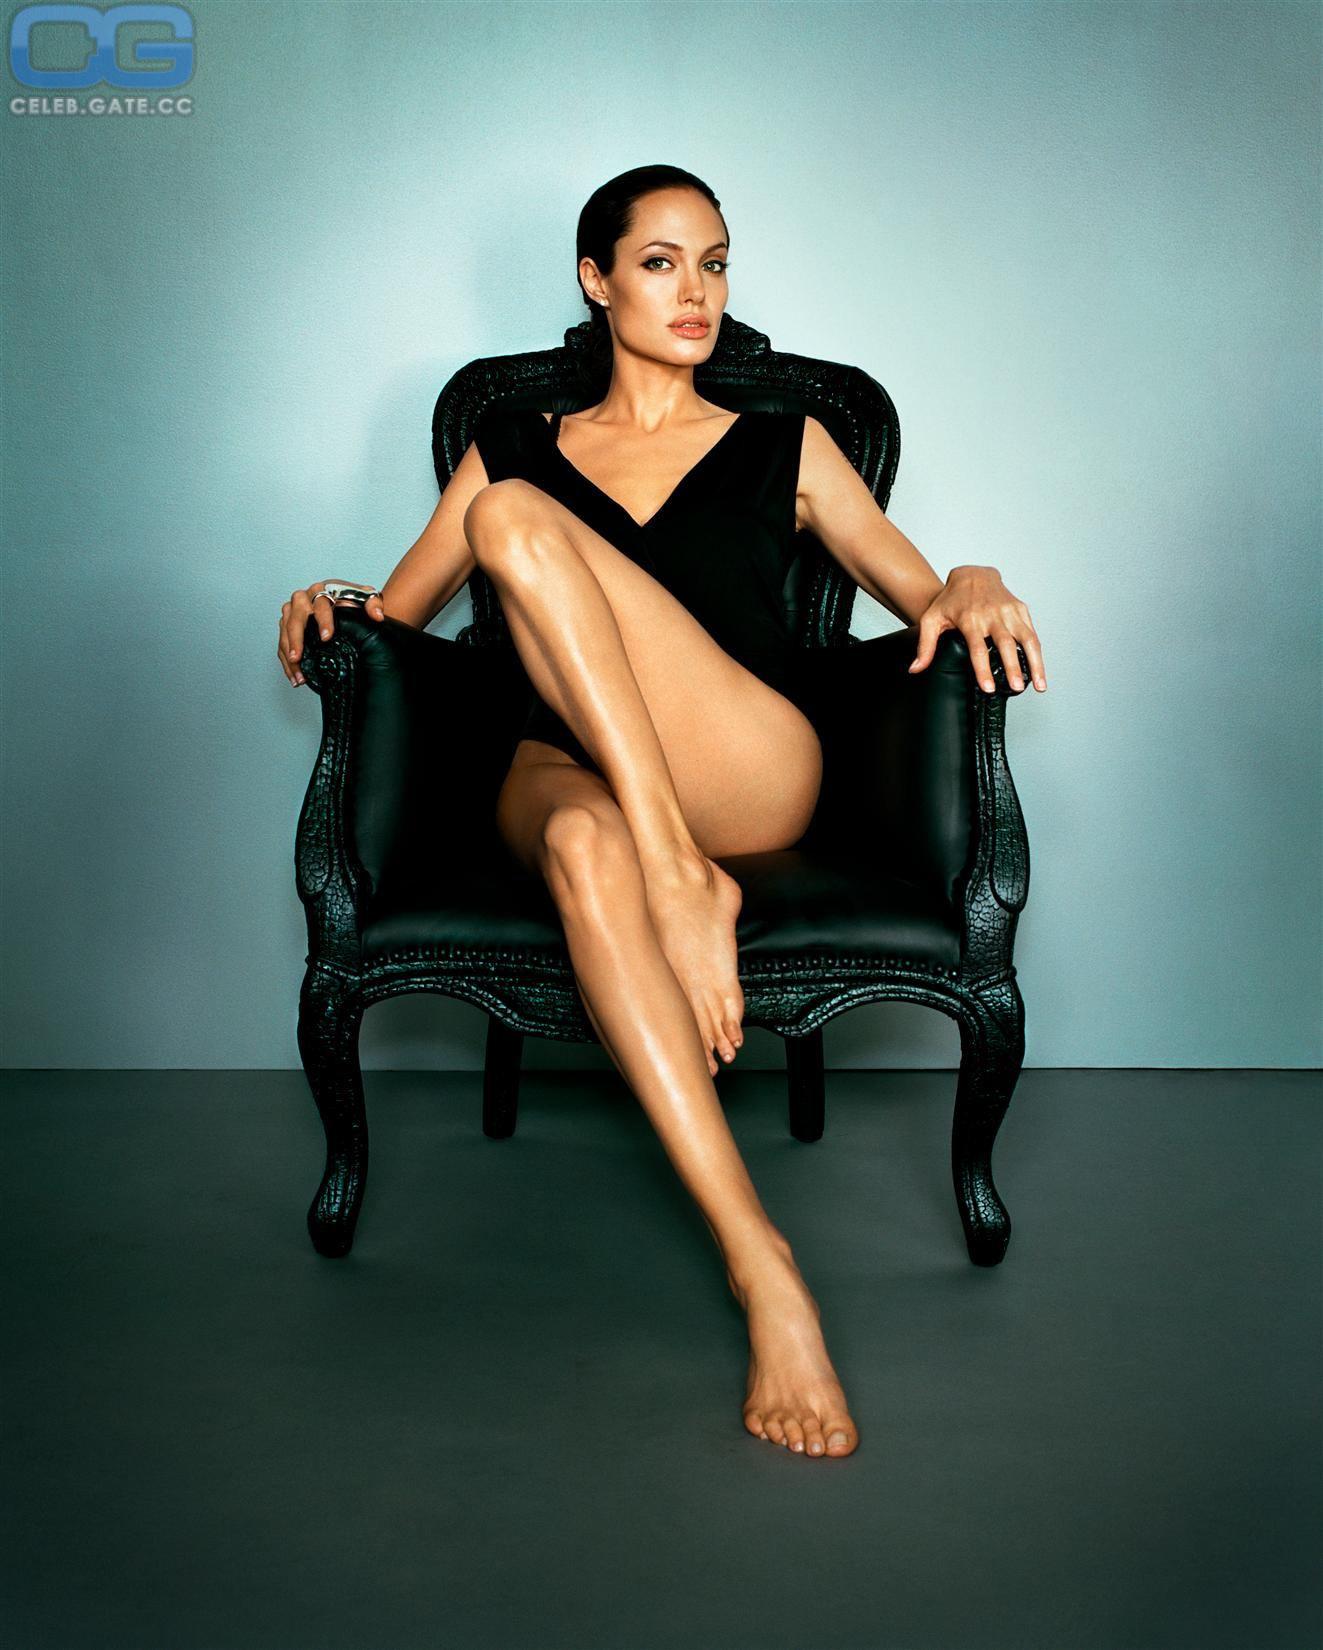 100 Pictures of Angelina Jolie Nackt